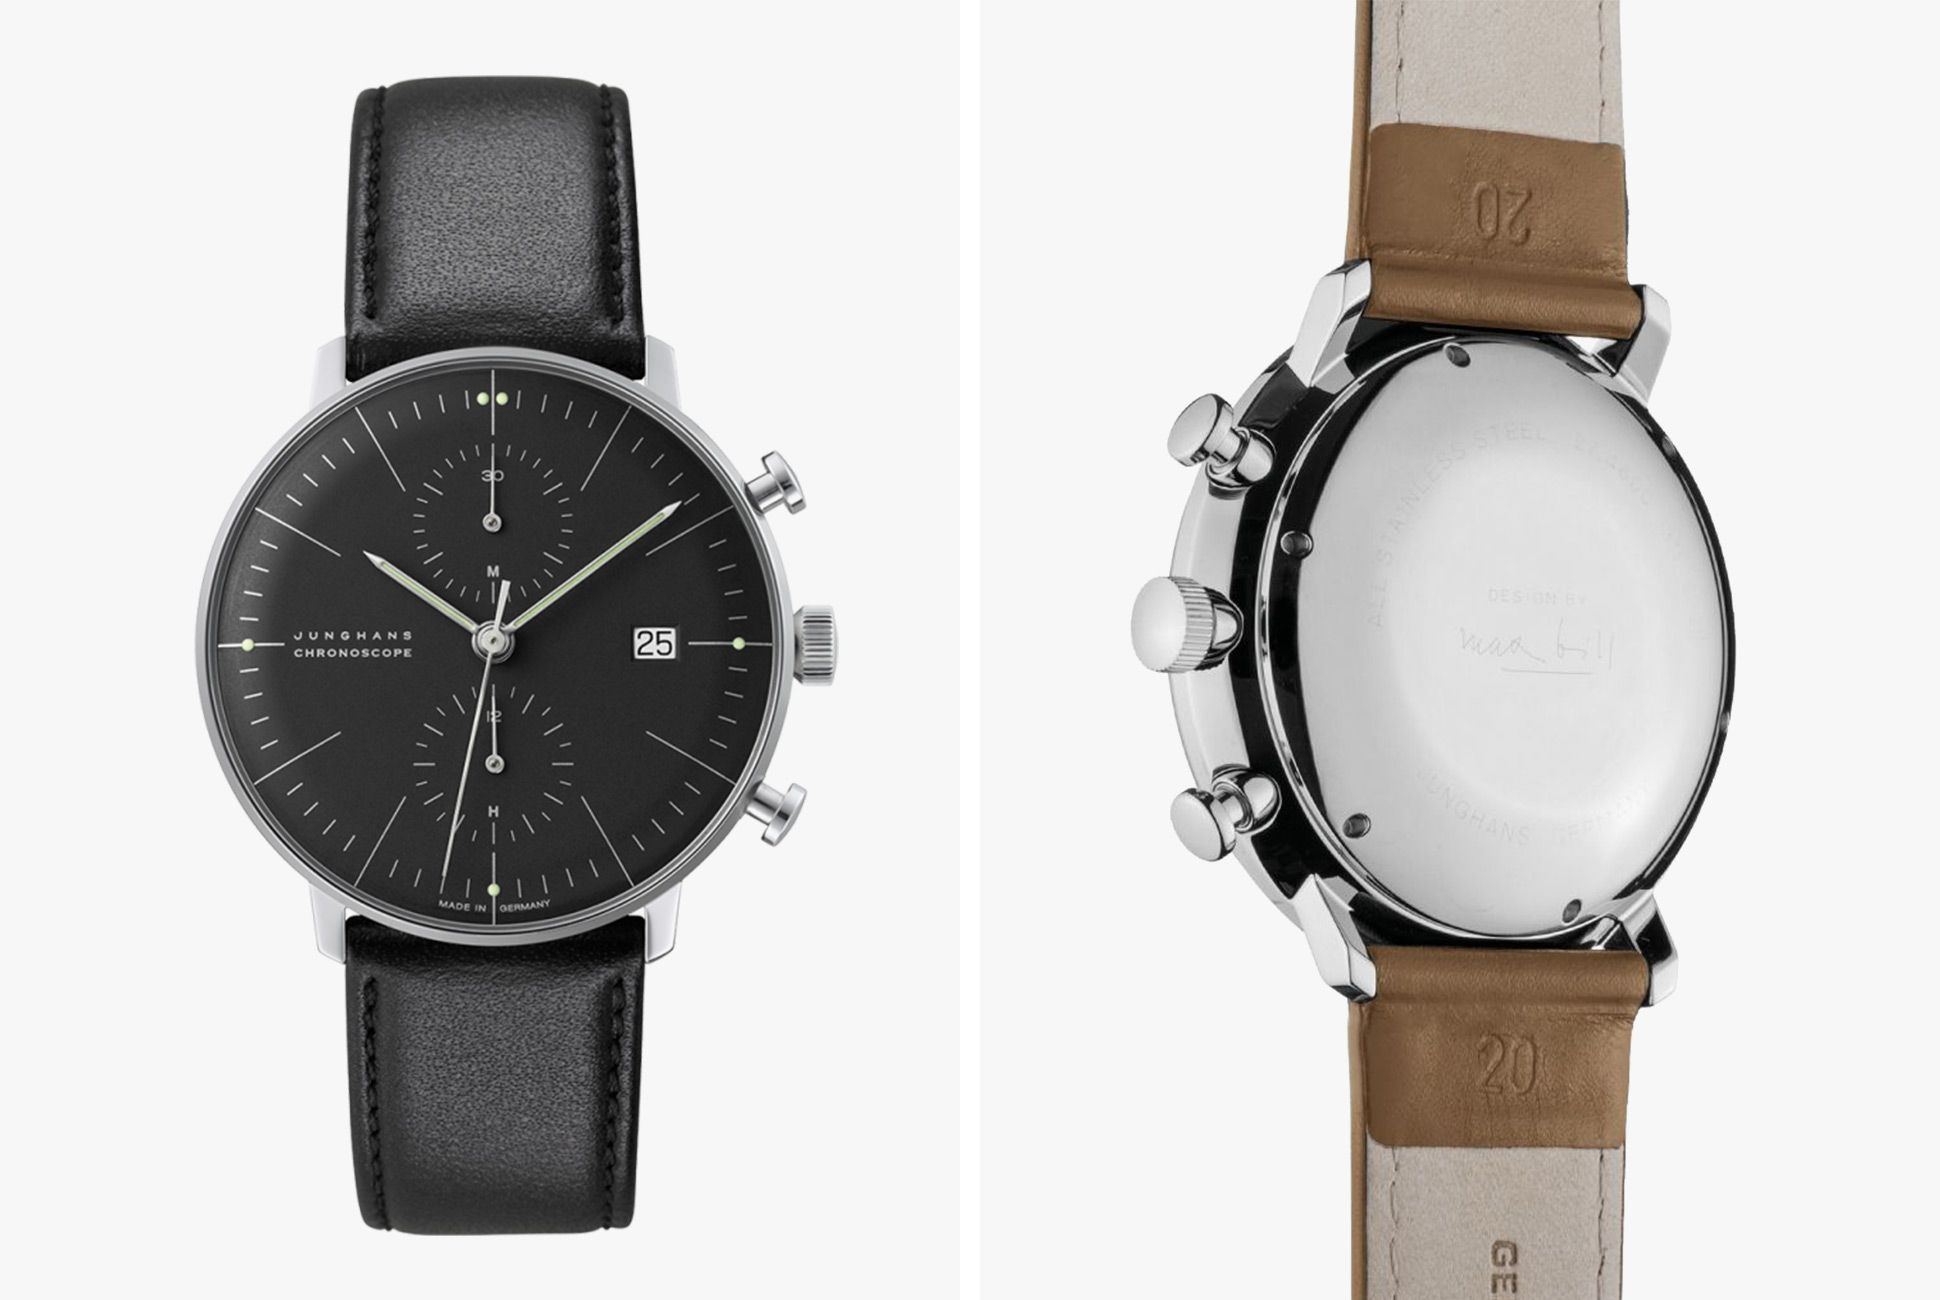 Junghans-Simple-Watches-Gear-Patrol